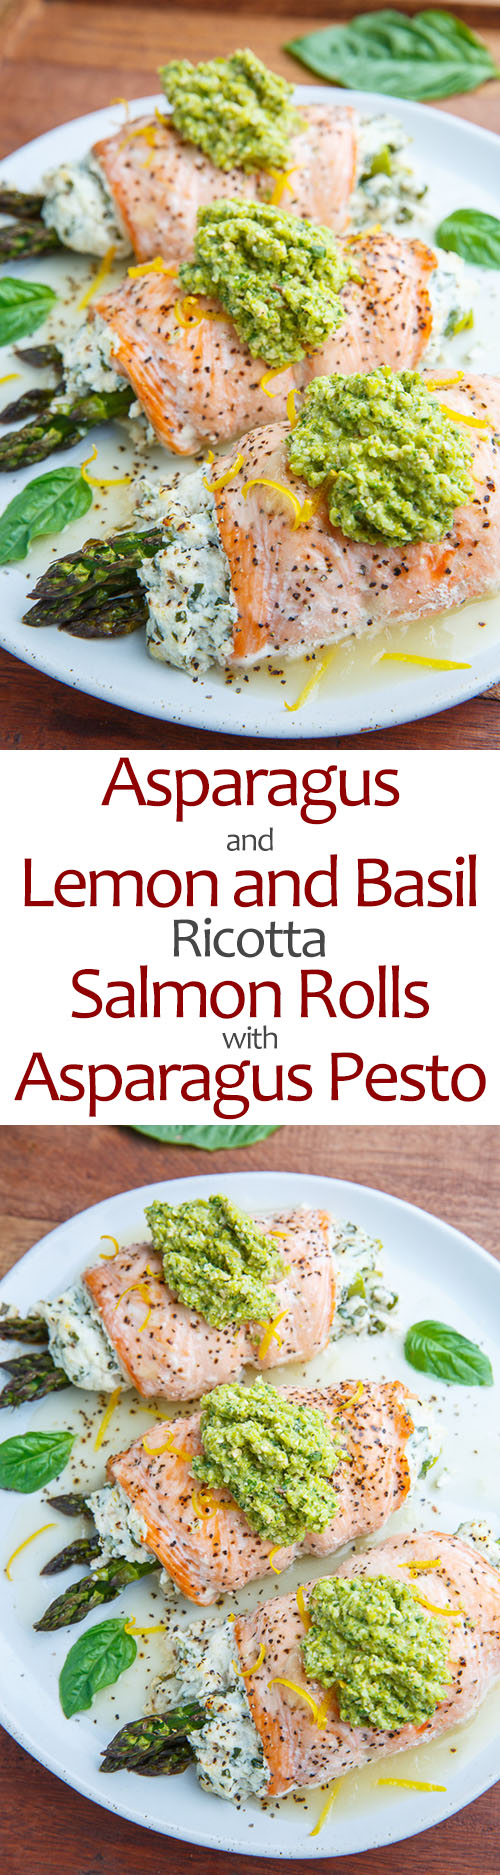 Asparagus and Lemon and Basil Ricotta Stuffed Salmon Rolls with Asparagus Pesto